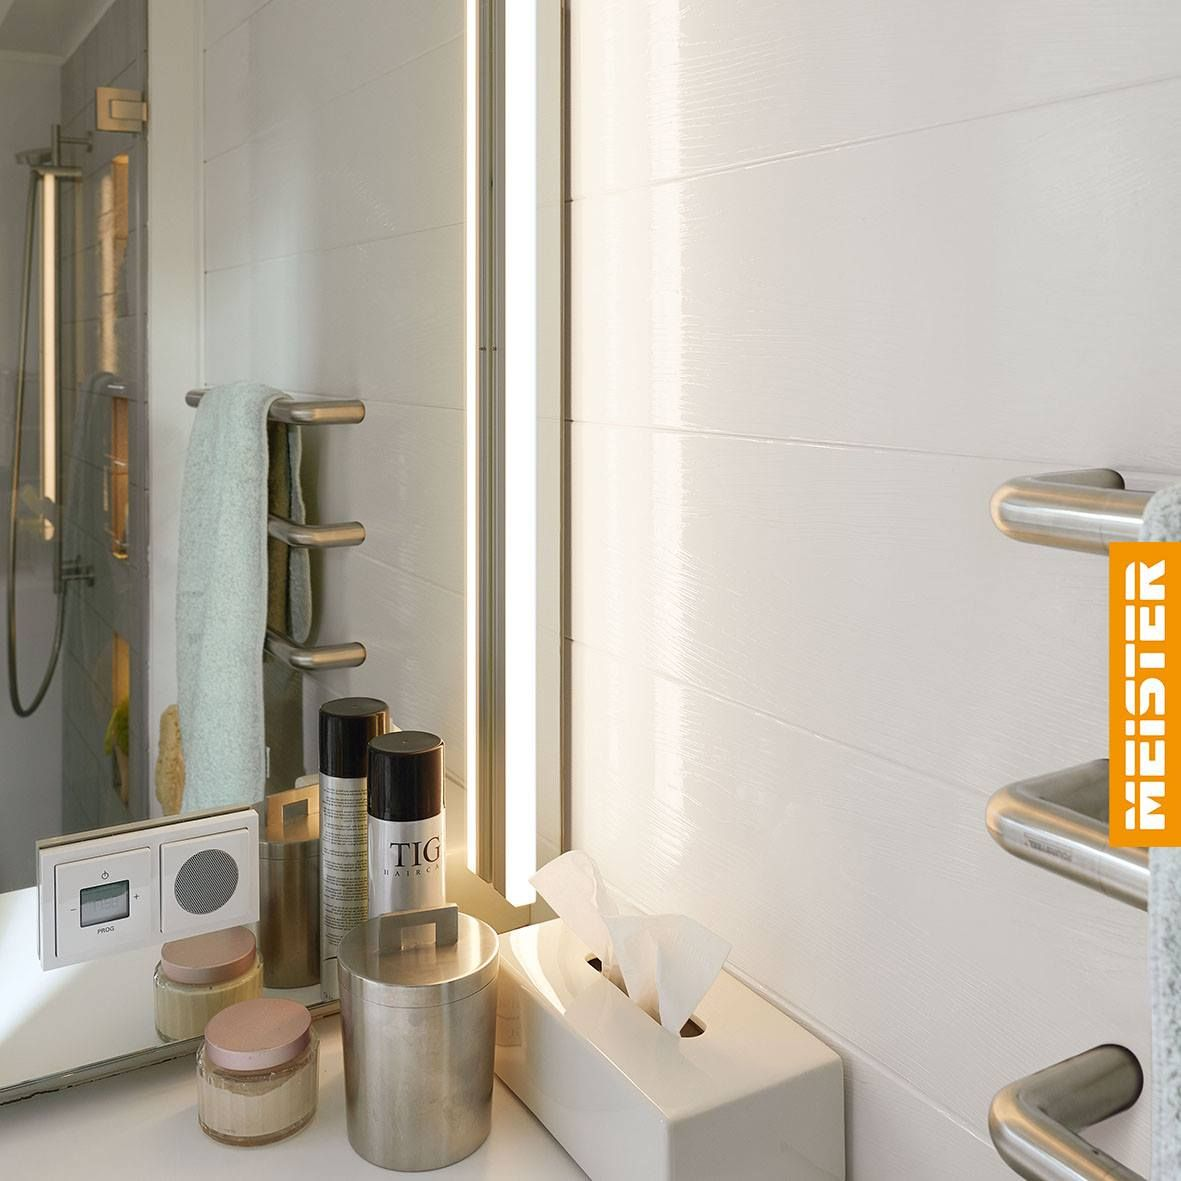 Wandpaneele Im Bad Wall Panels In The Bathroom Paneele Raumgestaltung Wandverkleidung